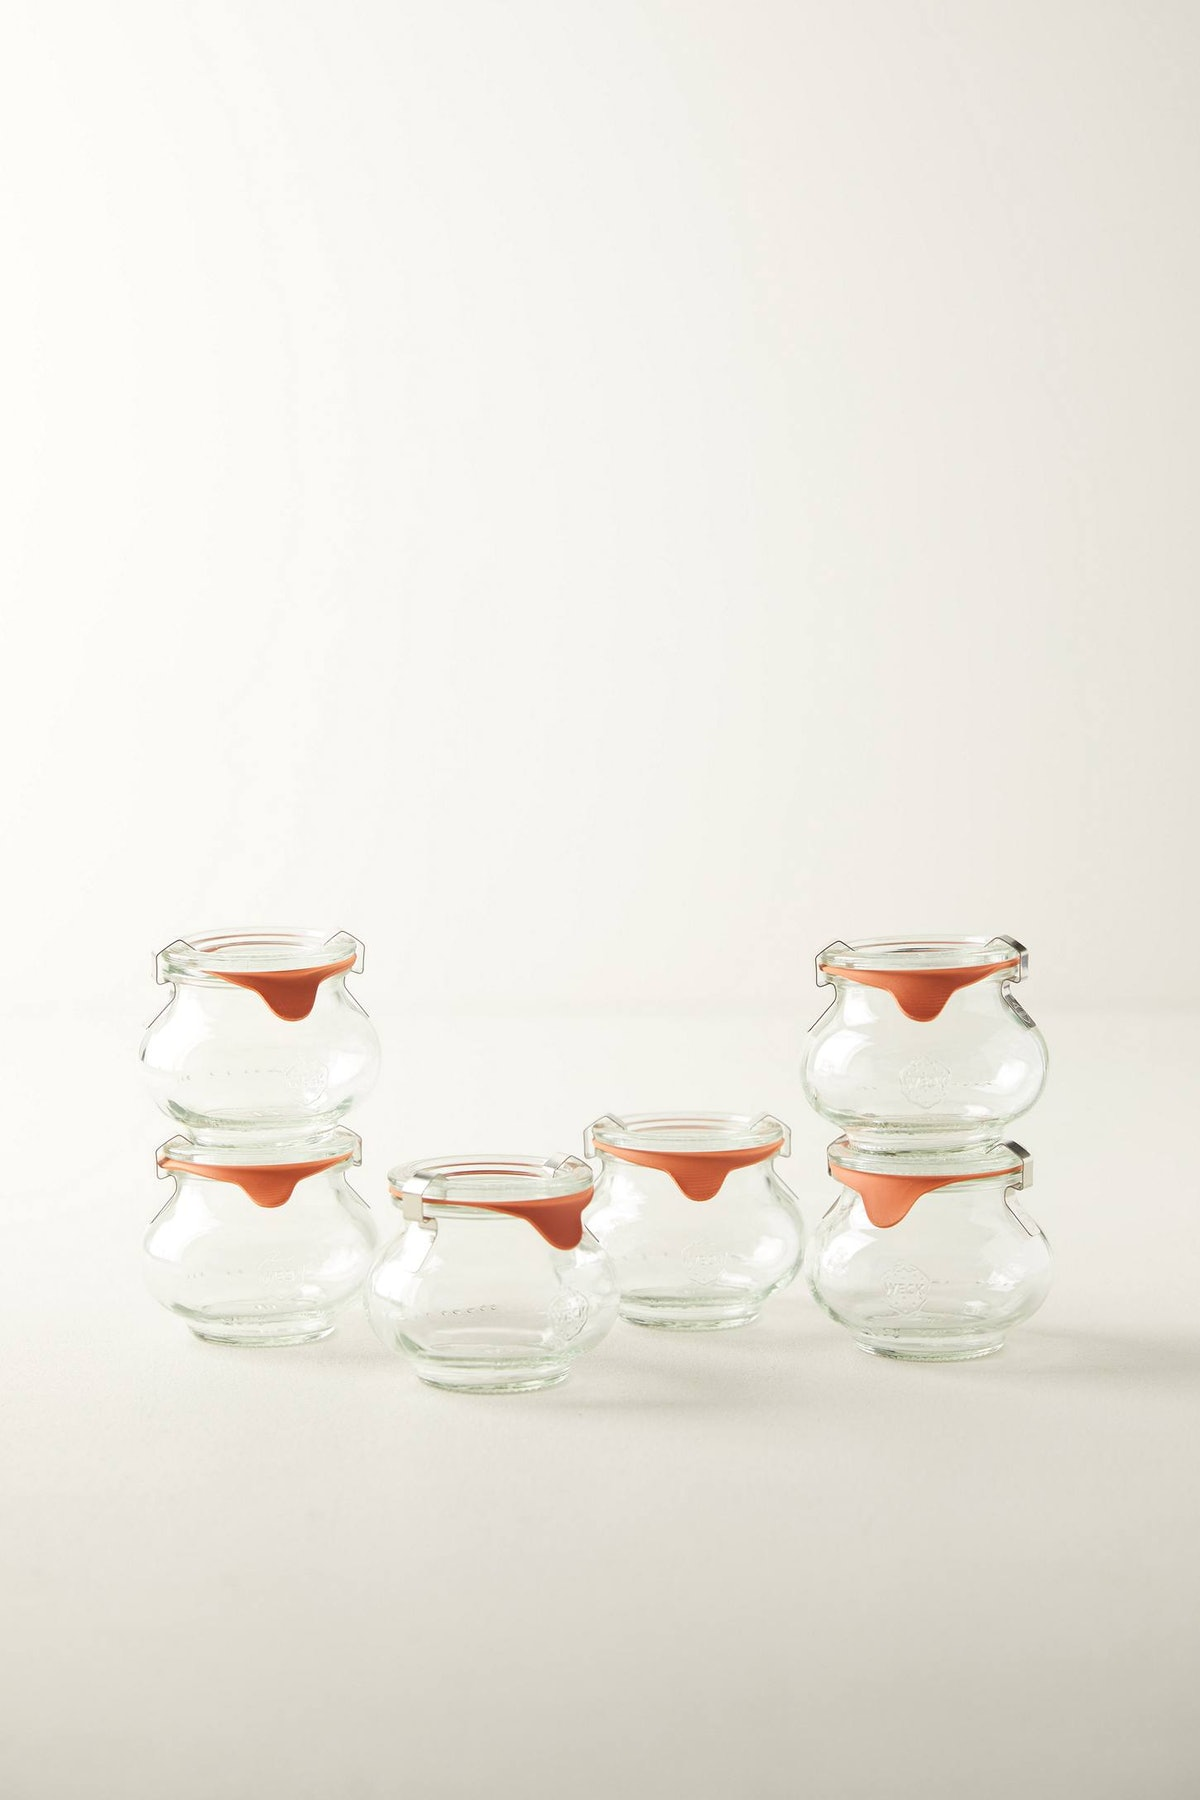 7.4 oz Deco Weck Jar Set